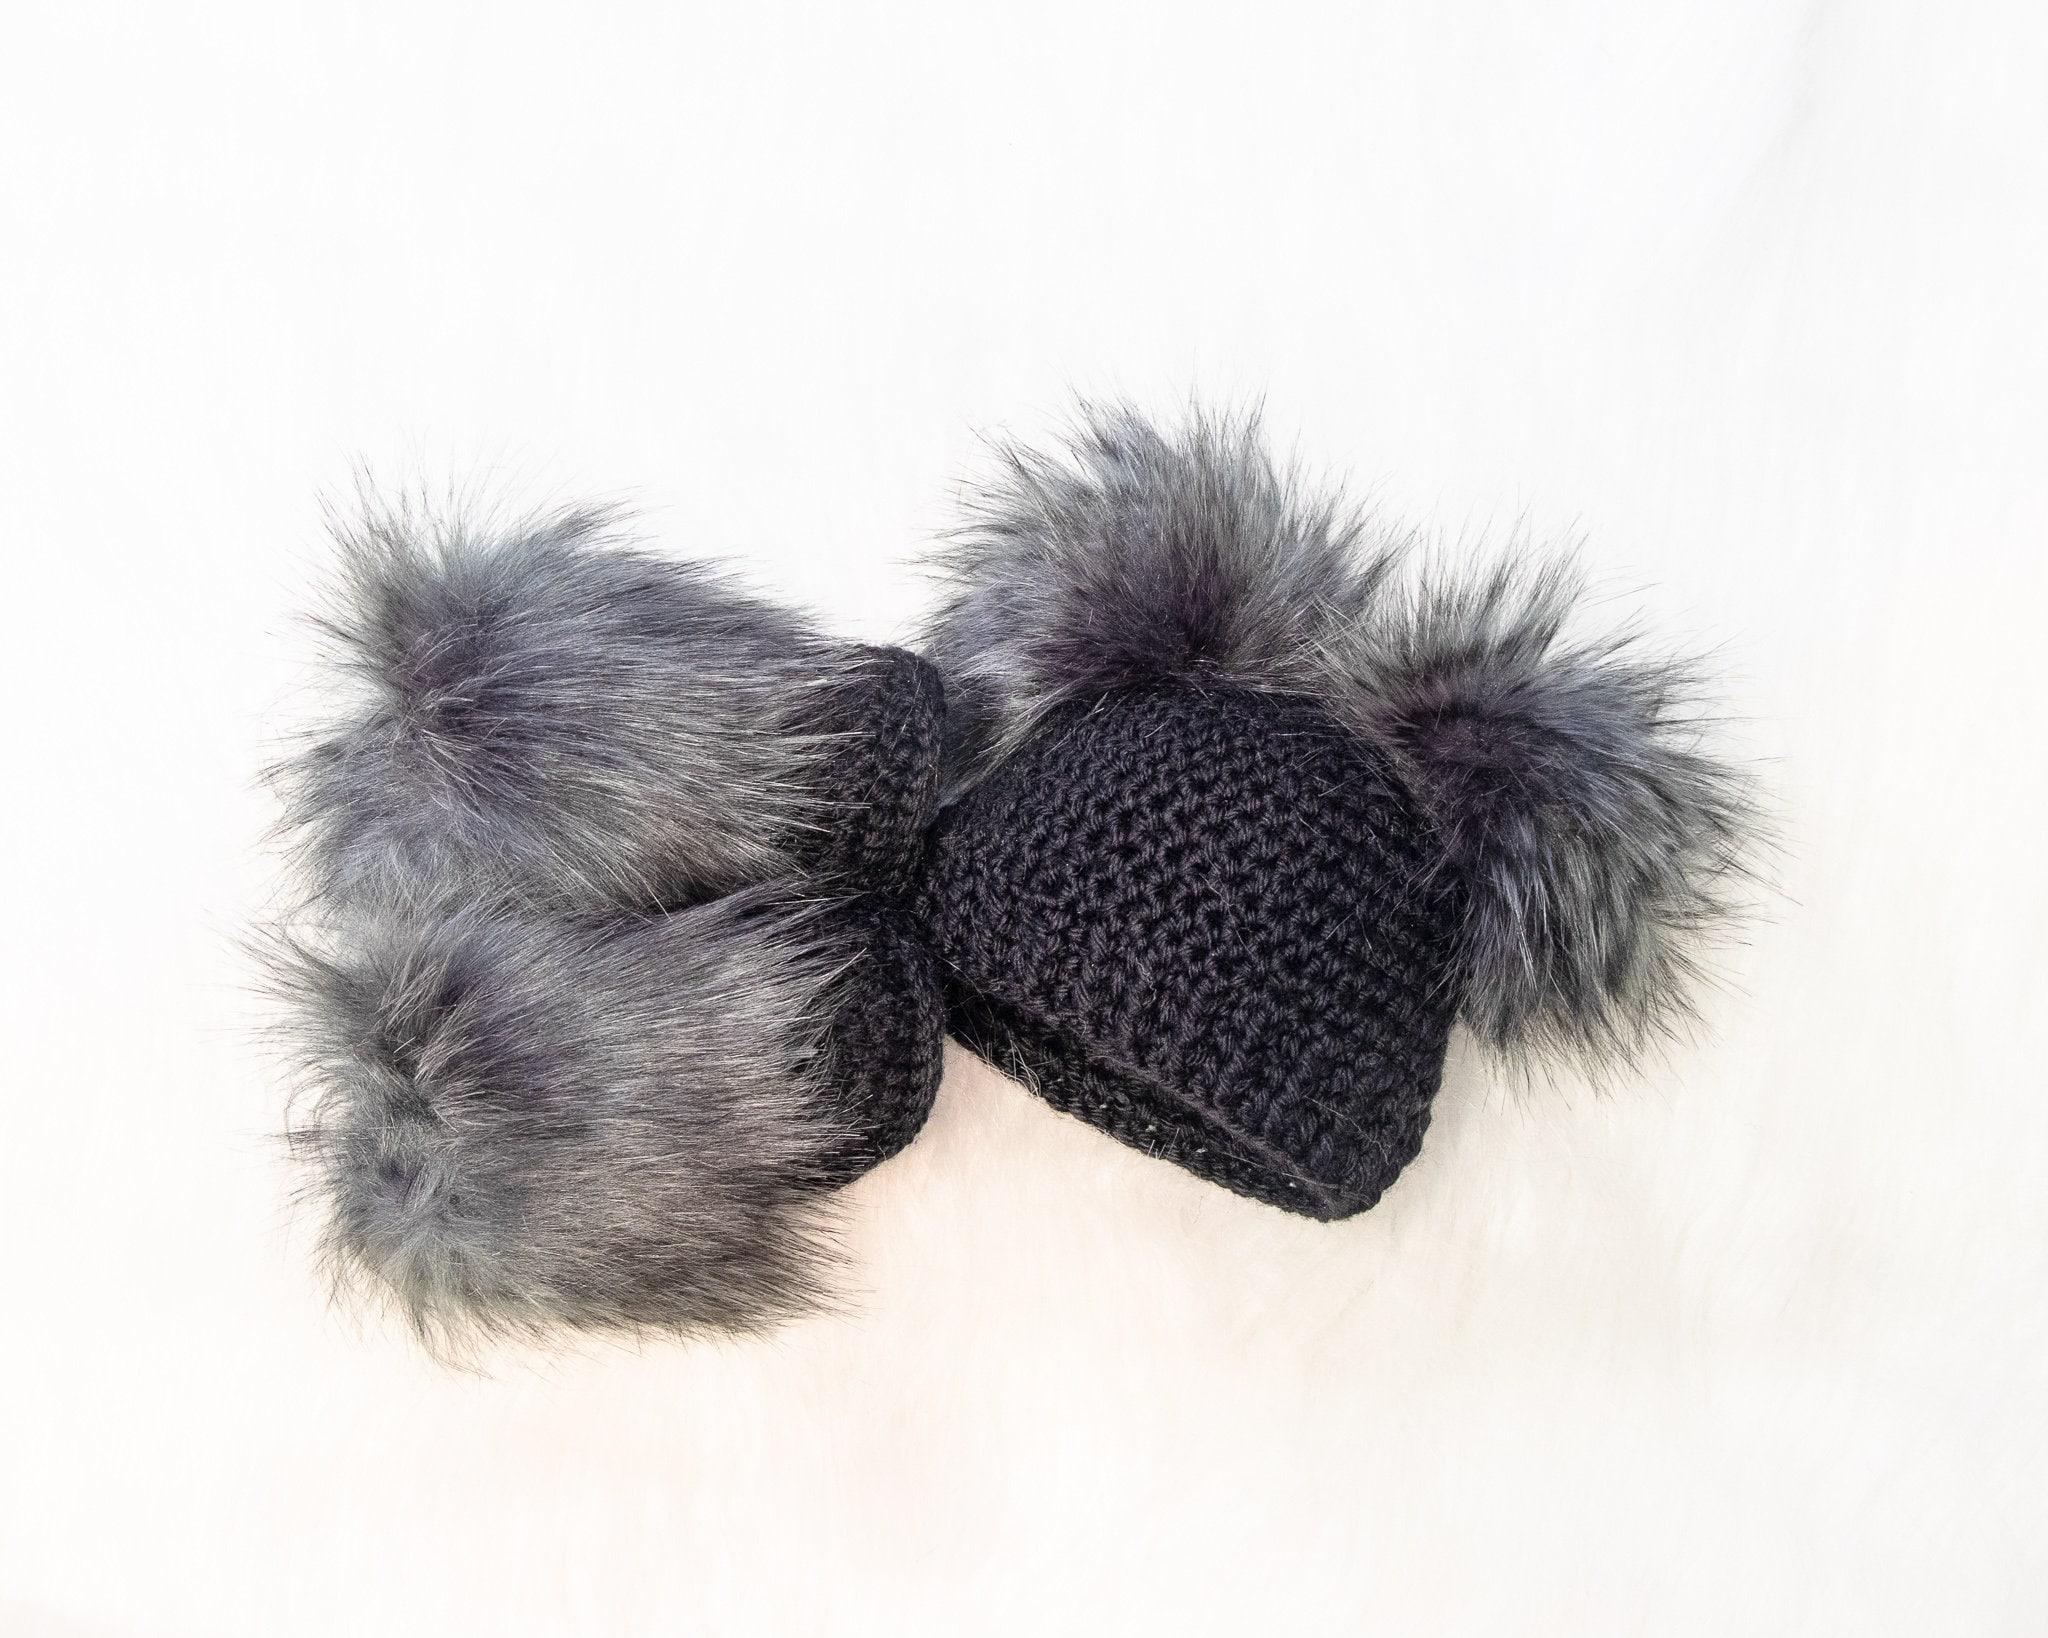 Fur booties Gender neutral baby set Gold Booties and hat set Newborn winter clothes Crochet baby clothes Double pom pom hat and booties